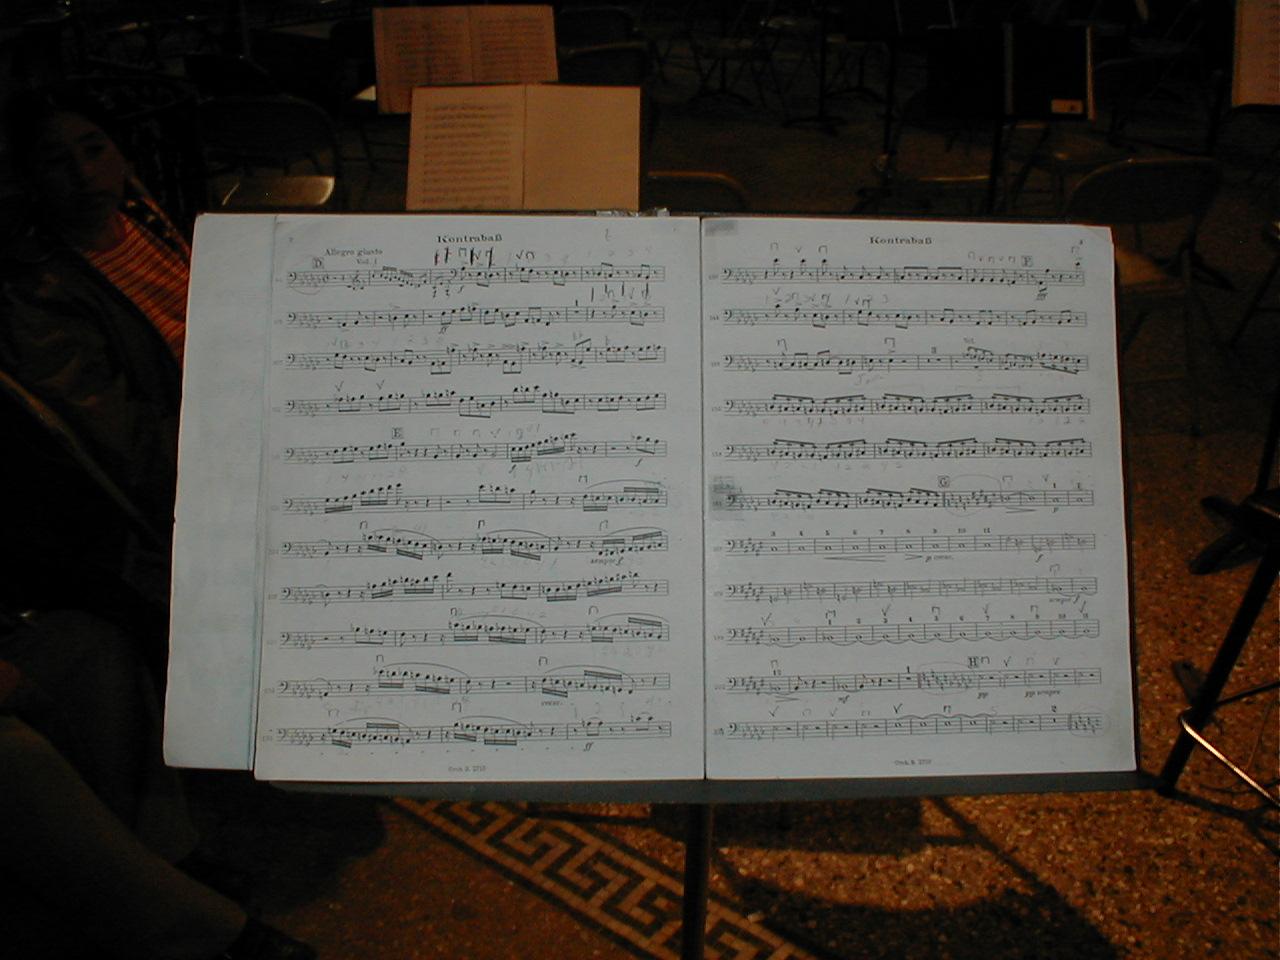 dario scripts notes music musicnotes partiture partitude orchestra musical paper